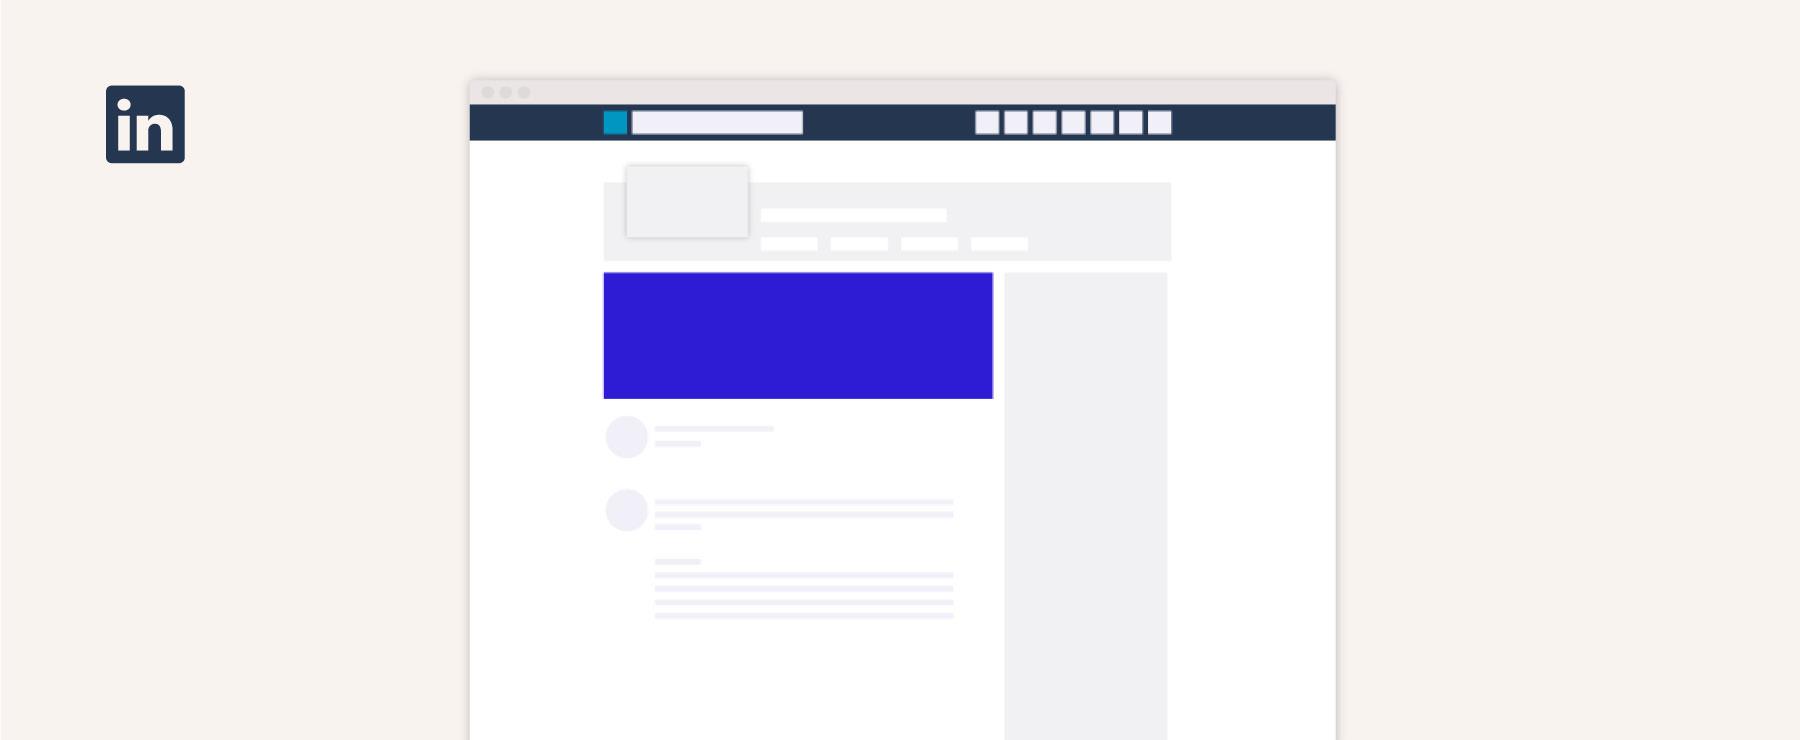 Linkedin hero image size guide